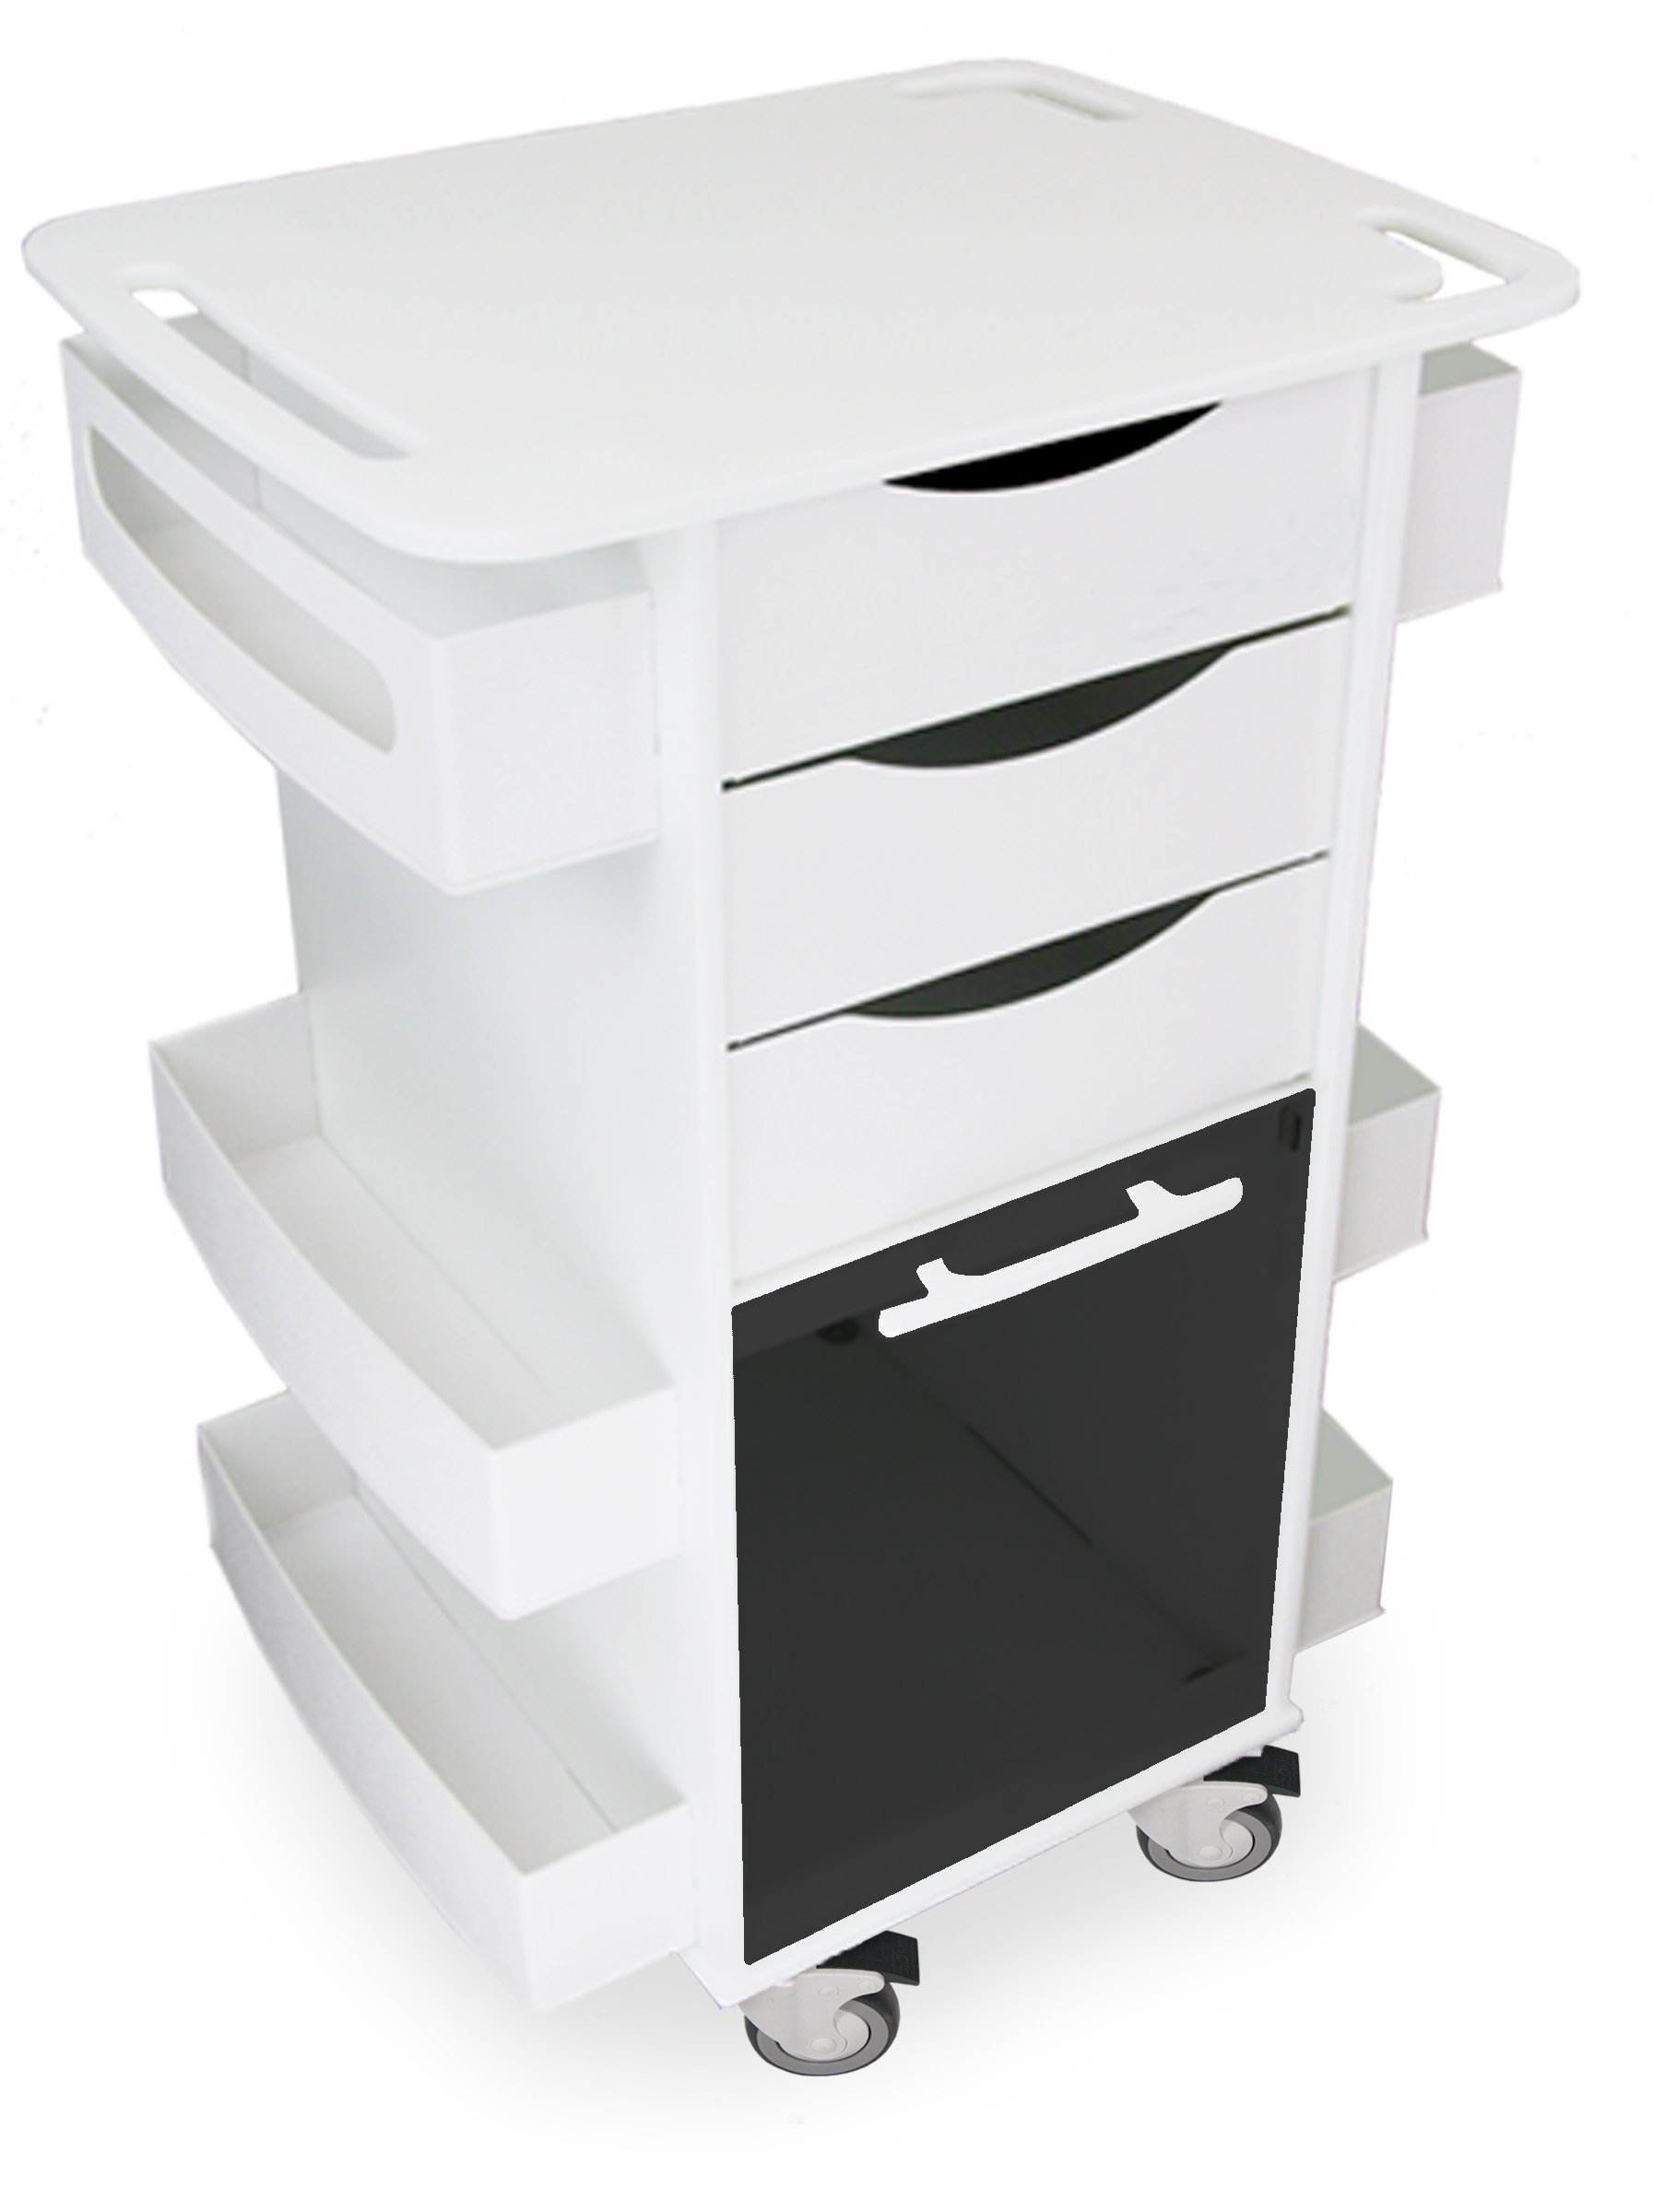 TrippNT 53161 Polyethylene/ABS Locking Core DX Multi-Tasking Medical Cart with Smoke PETG Sliding Door, 23'' Width x 35'' Height x 19'' Depth, White